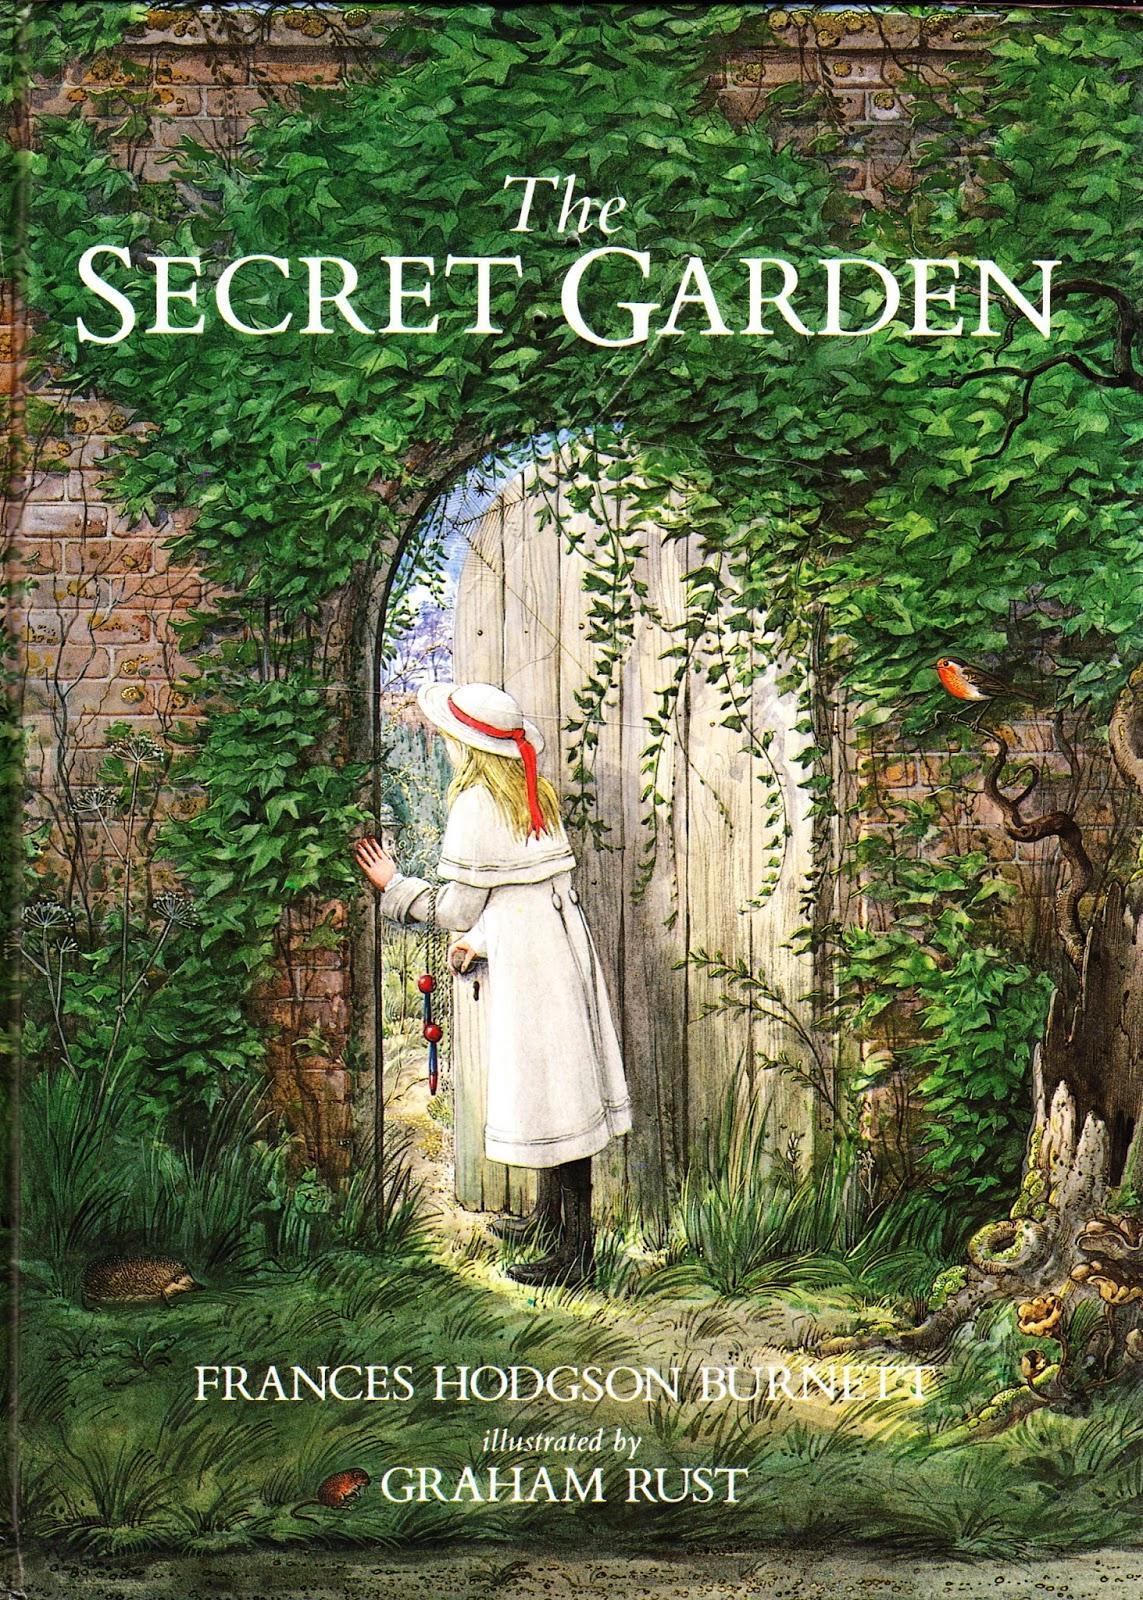 THE SECRET GARDEN BY FRANCES HODGSON BURNETT PUBLISHED 1911 AVERAGE RATING 410 331 PAGES READ NOVEMBER 17TH